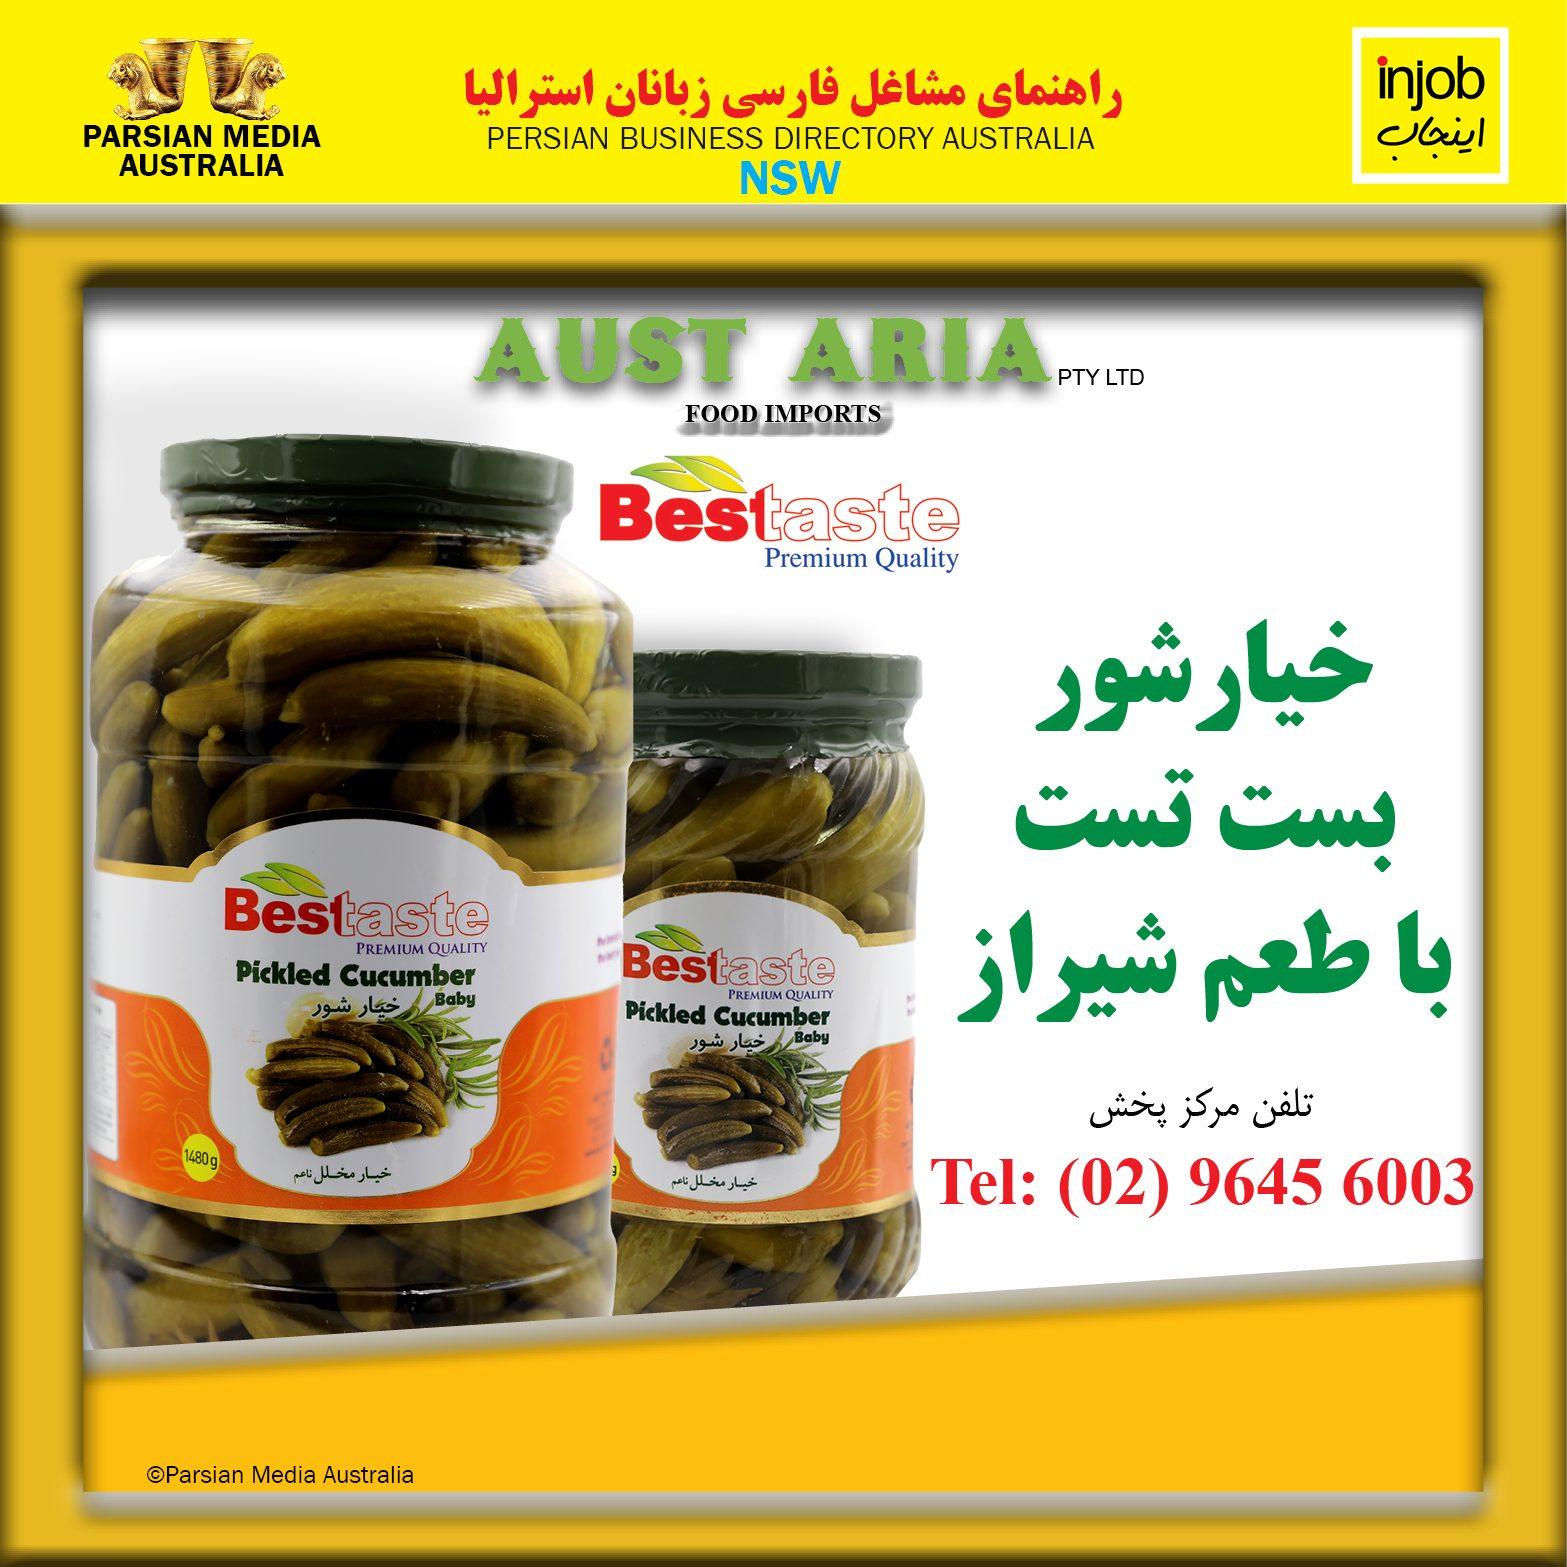 Austaria-pickles2-injob-icon.jpg